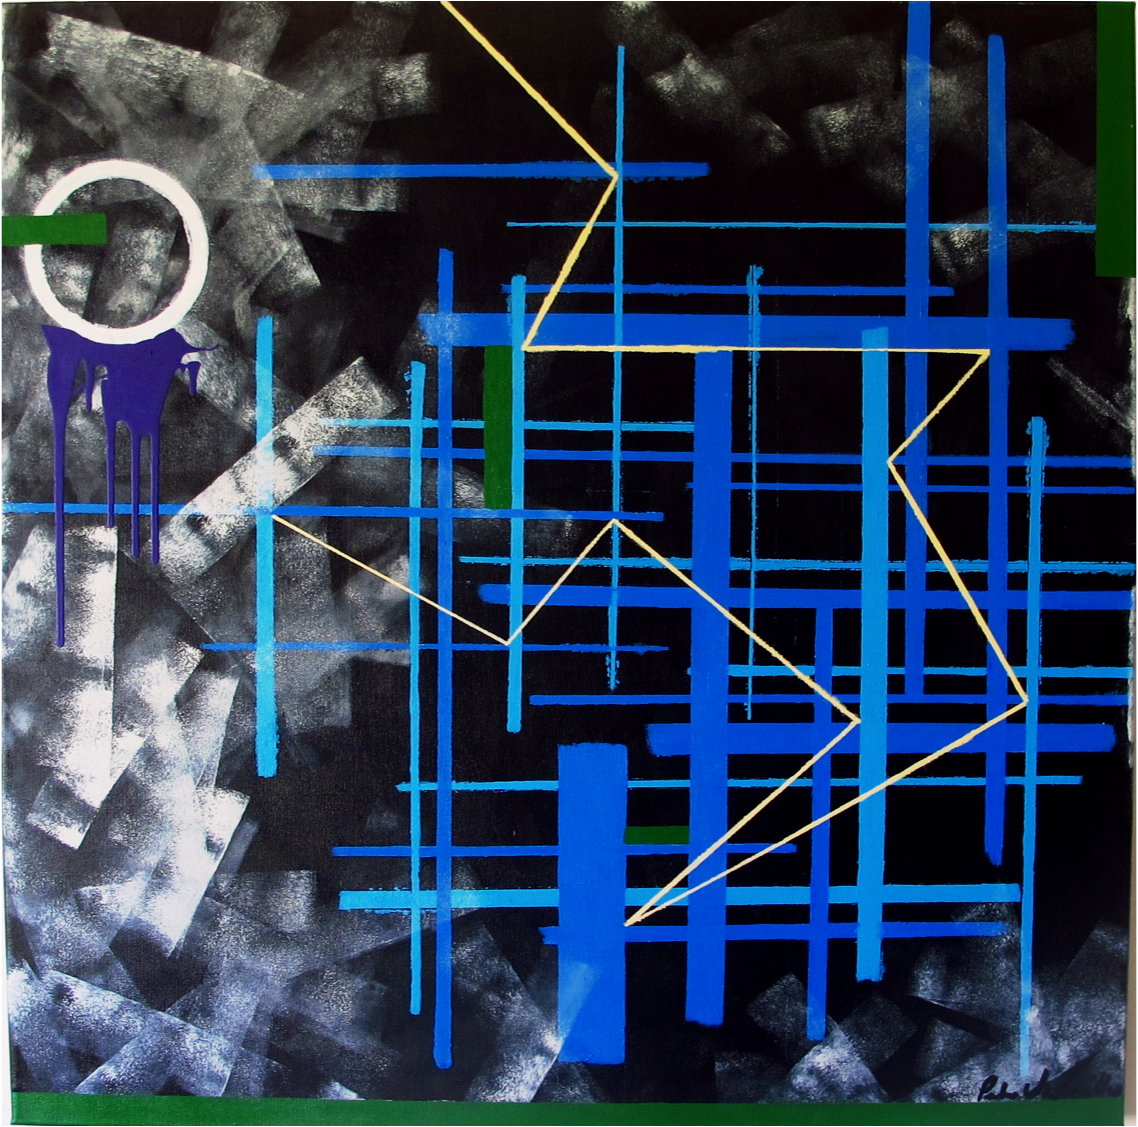 Labirinto Sonoro